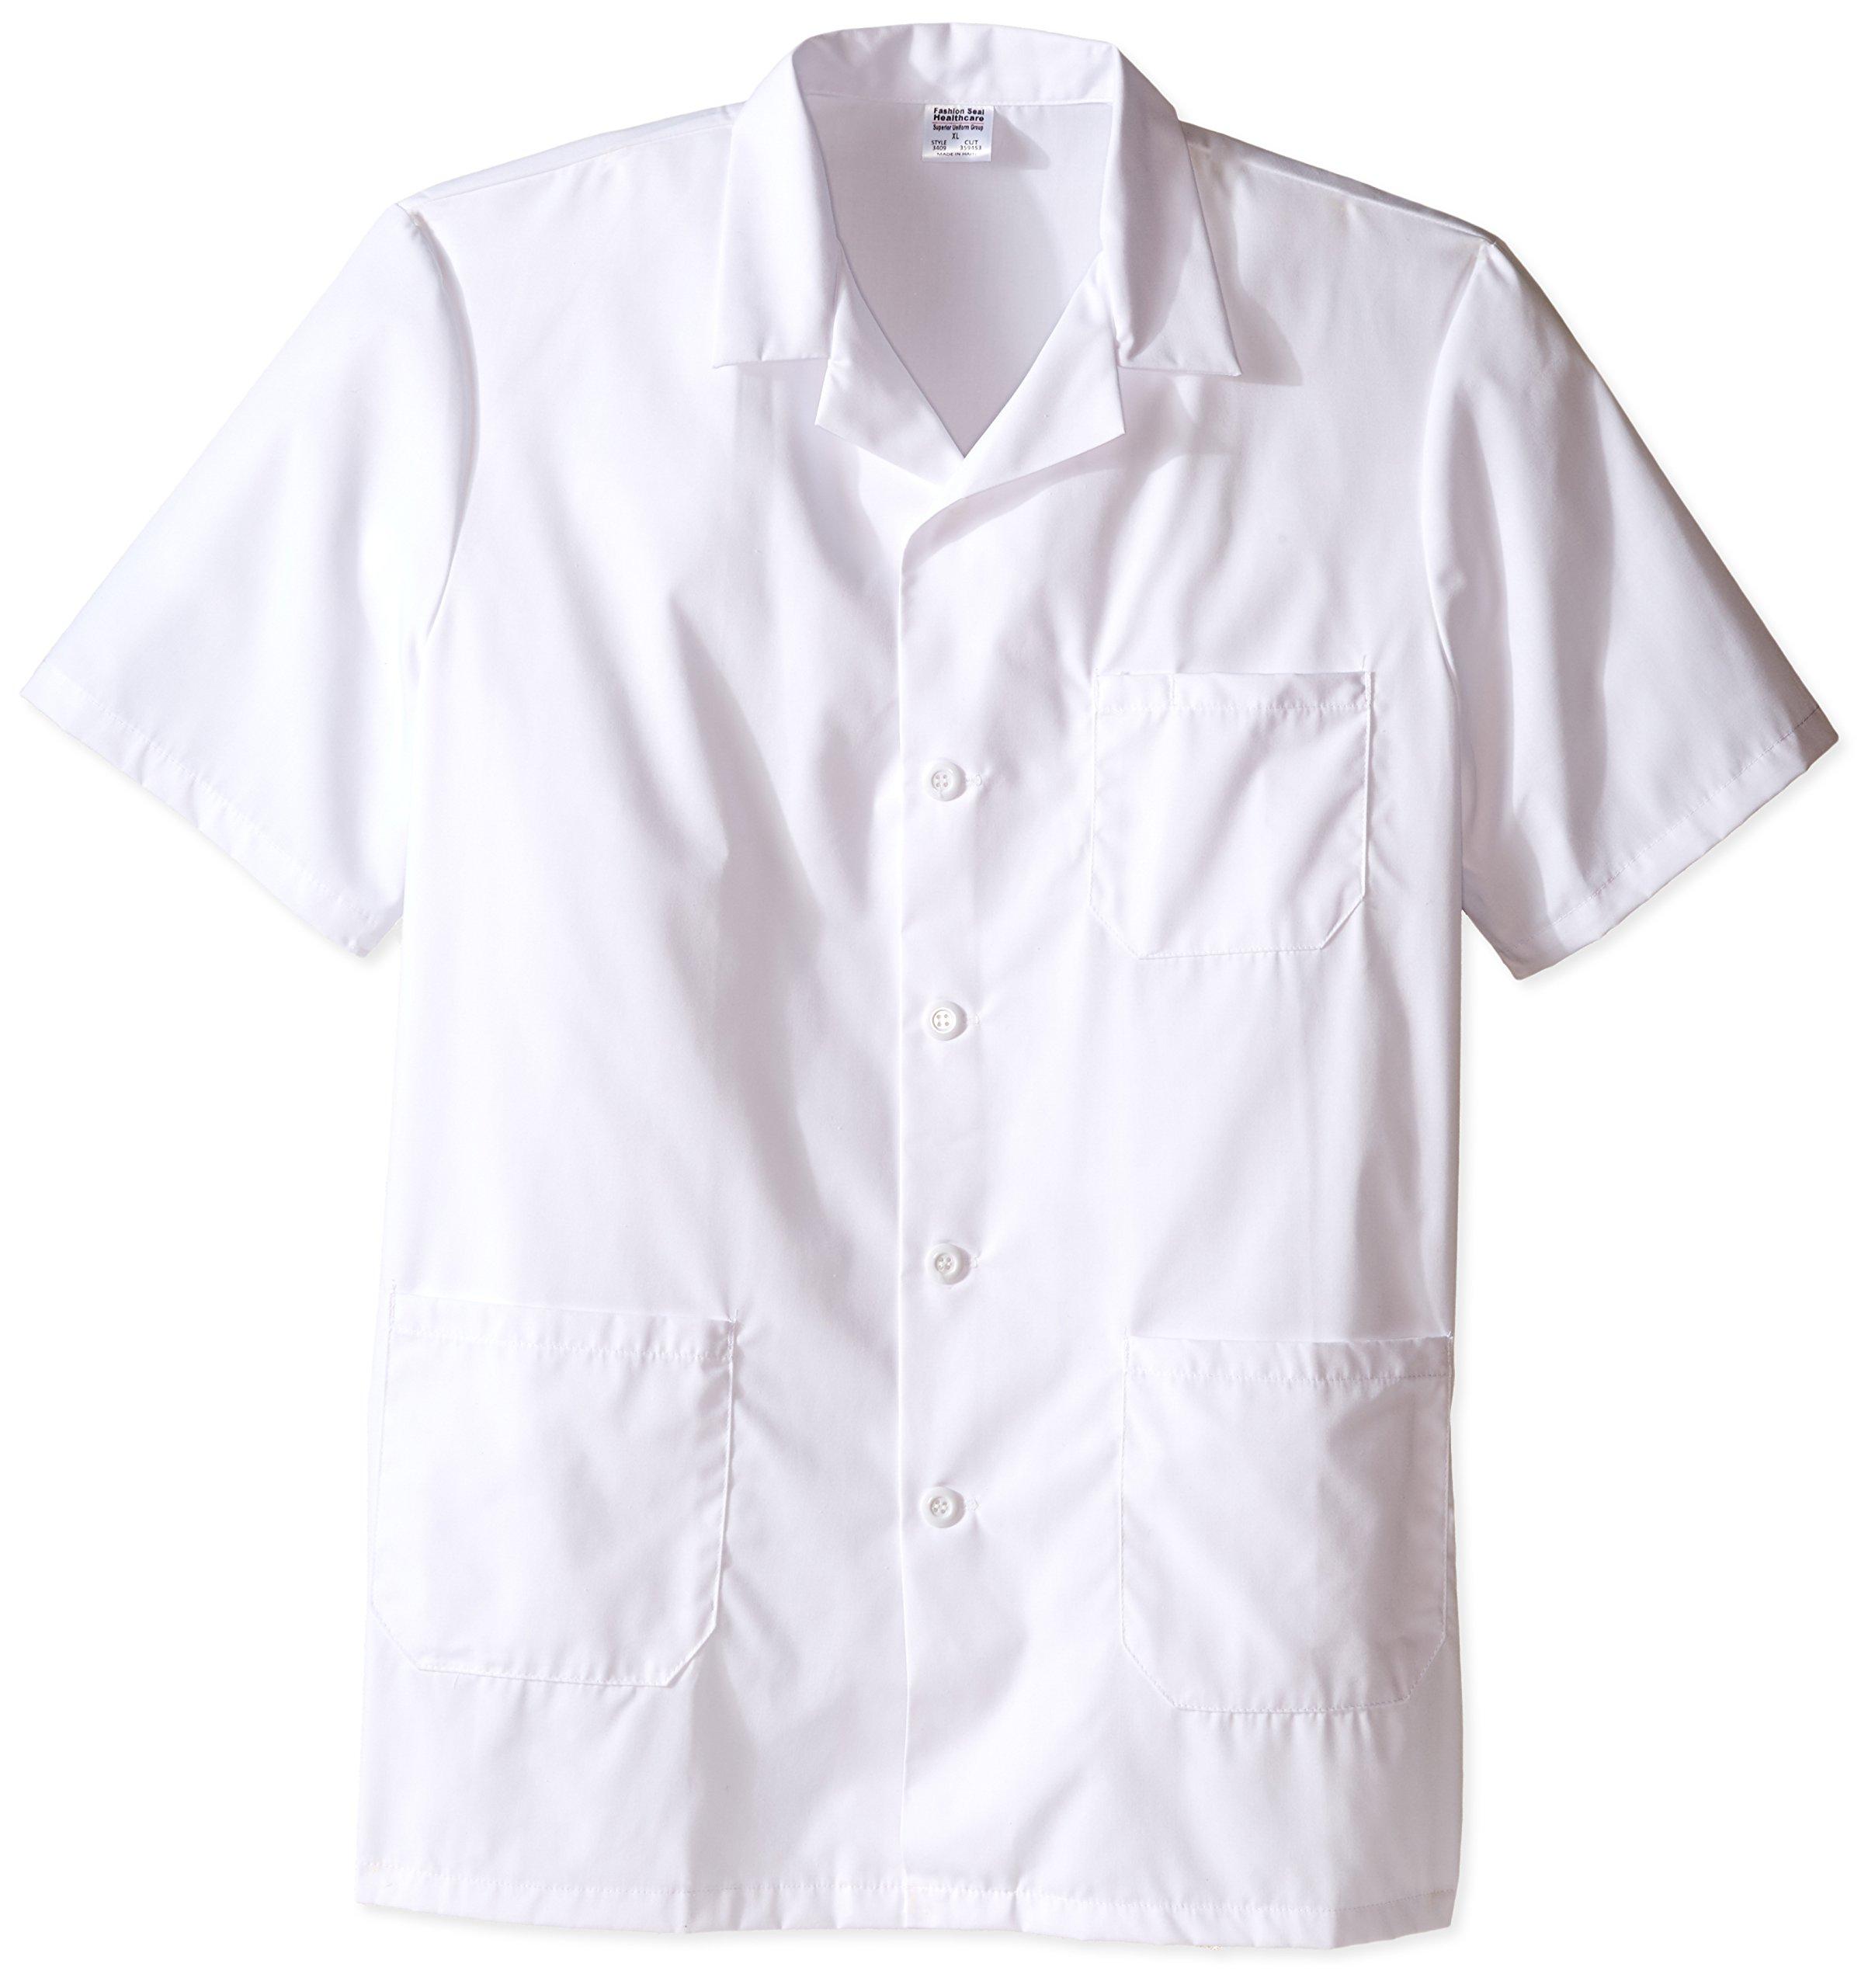 Worklon 3409 Polyester/Cotton Unisex Short Sleeve Pharmacy Lab Coat with Button Closure, X-Large, White